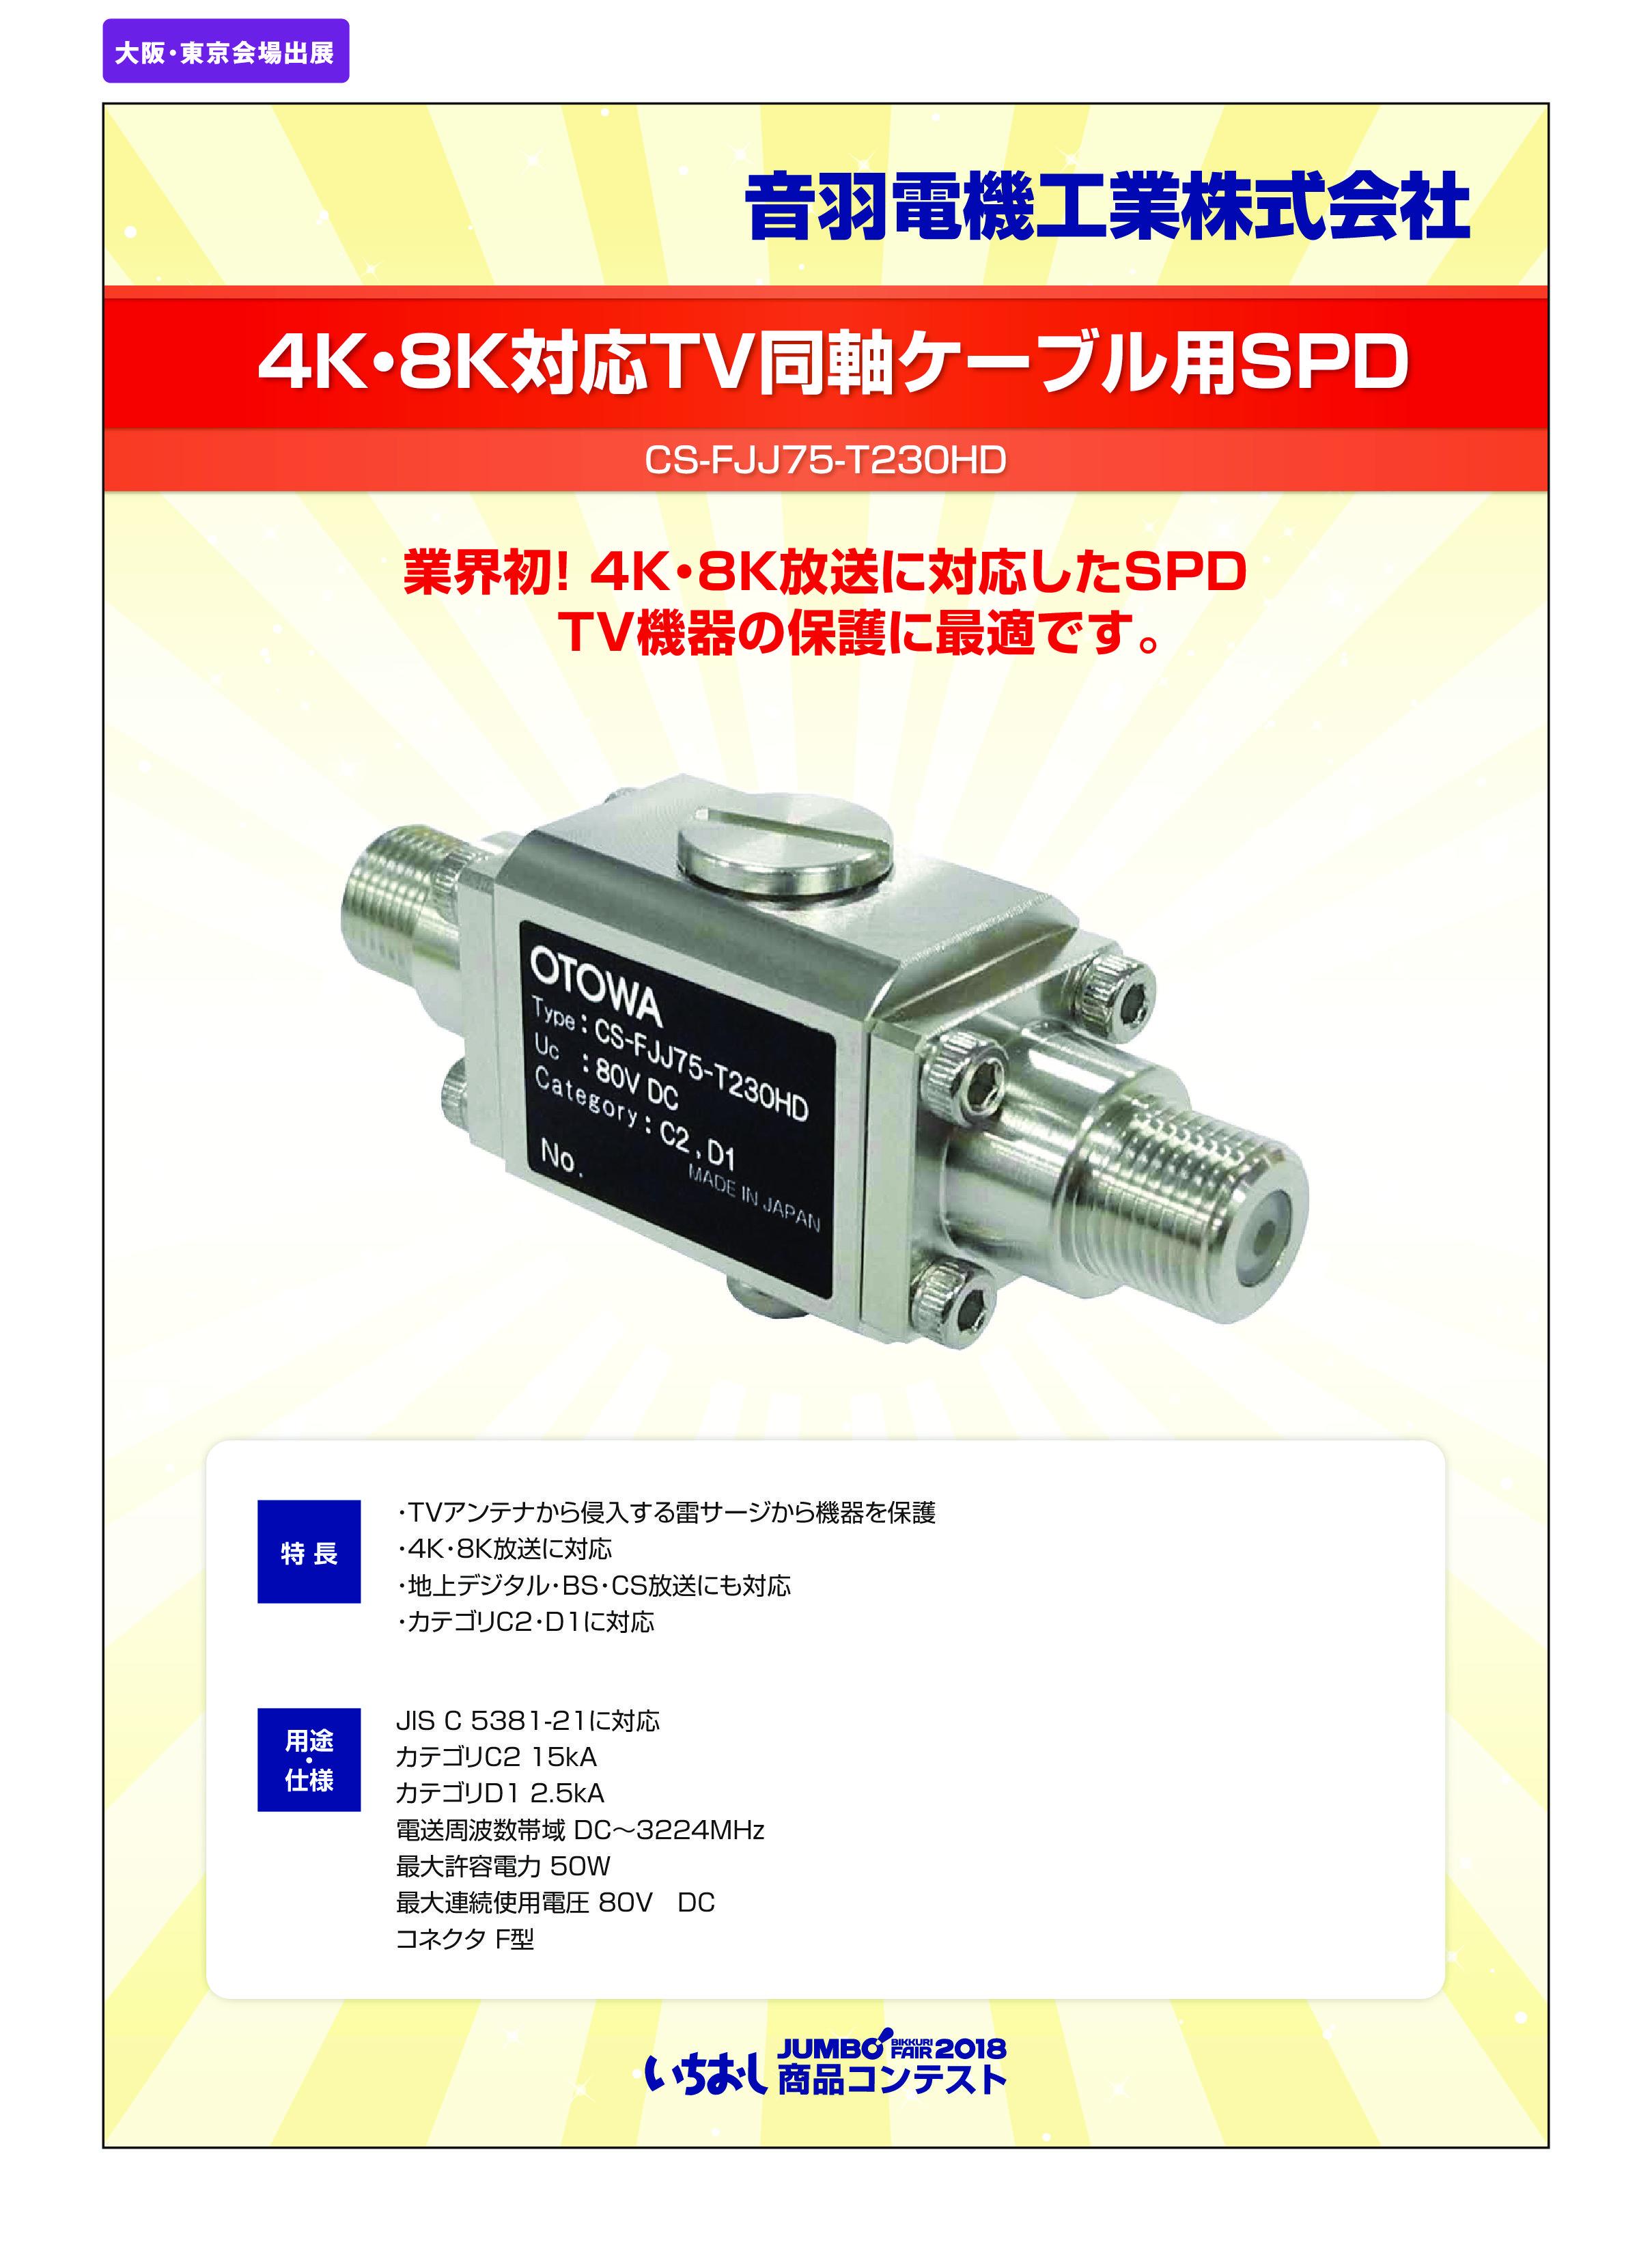 「4K・8K対応TV同軸ケーブル用SPD」音羽電機工業株式会社の画像